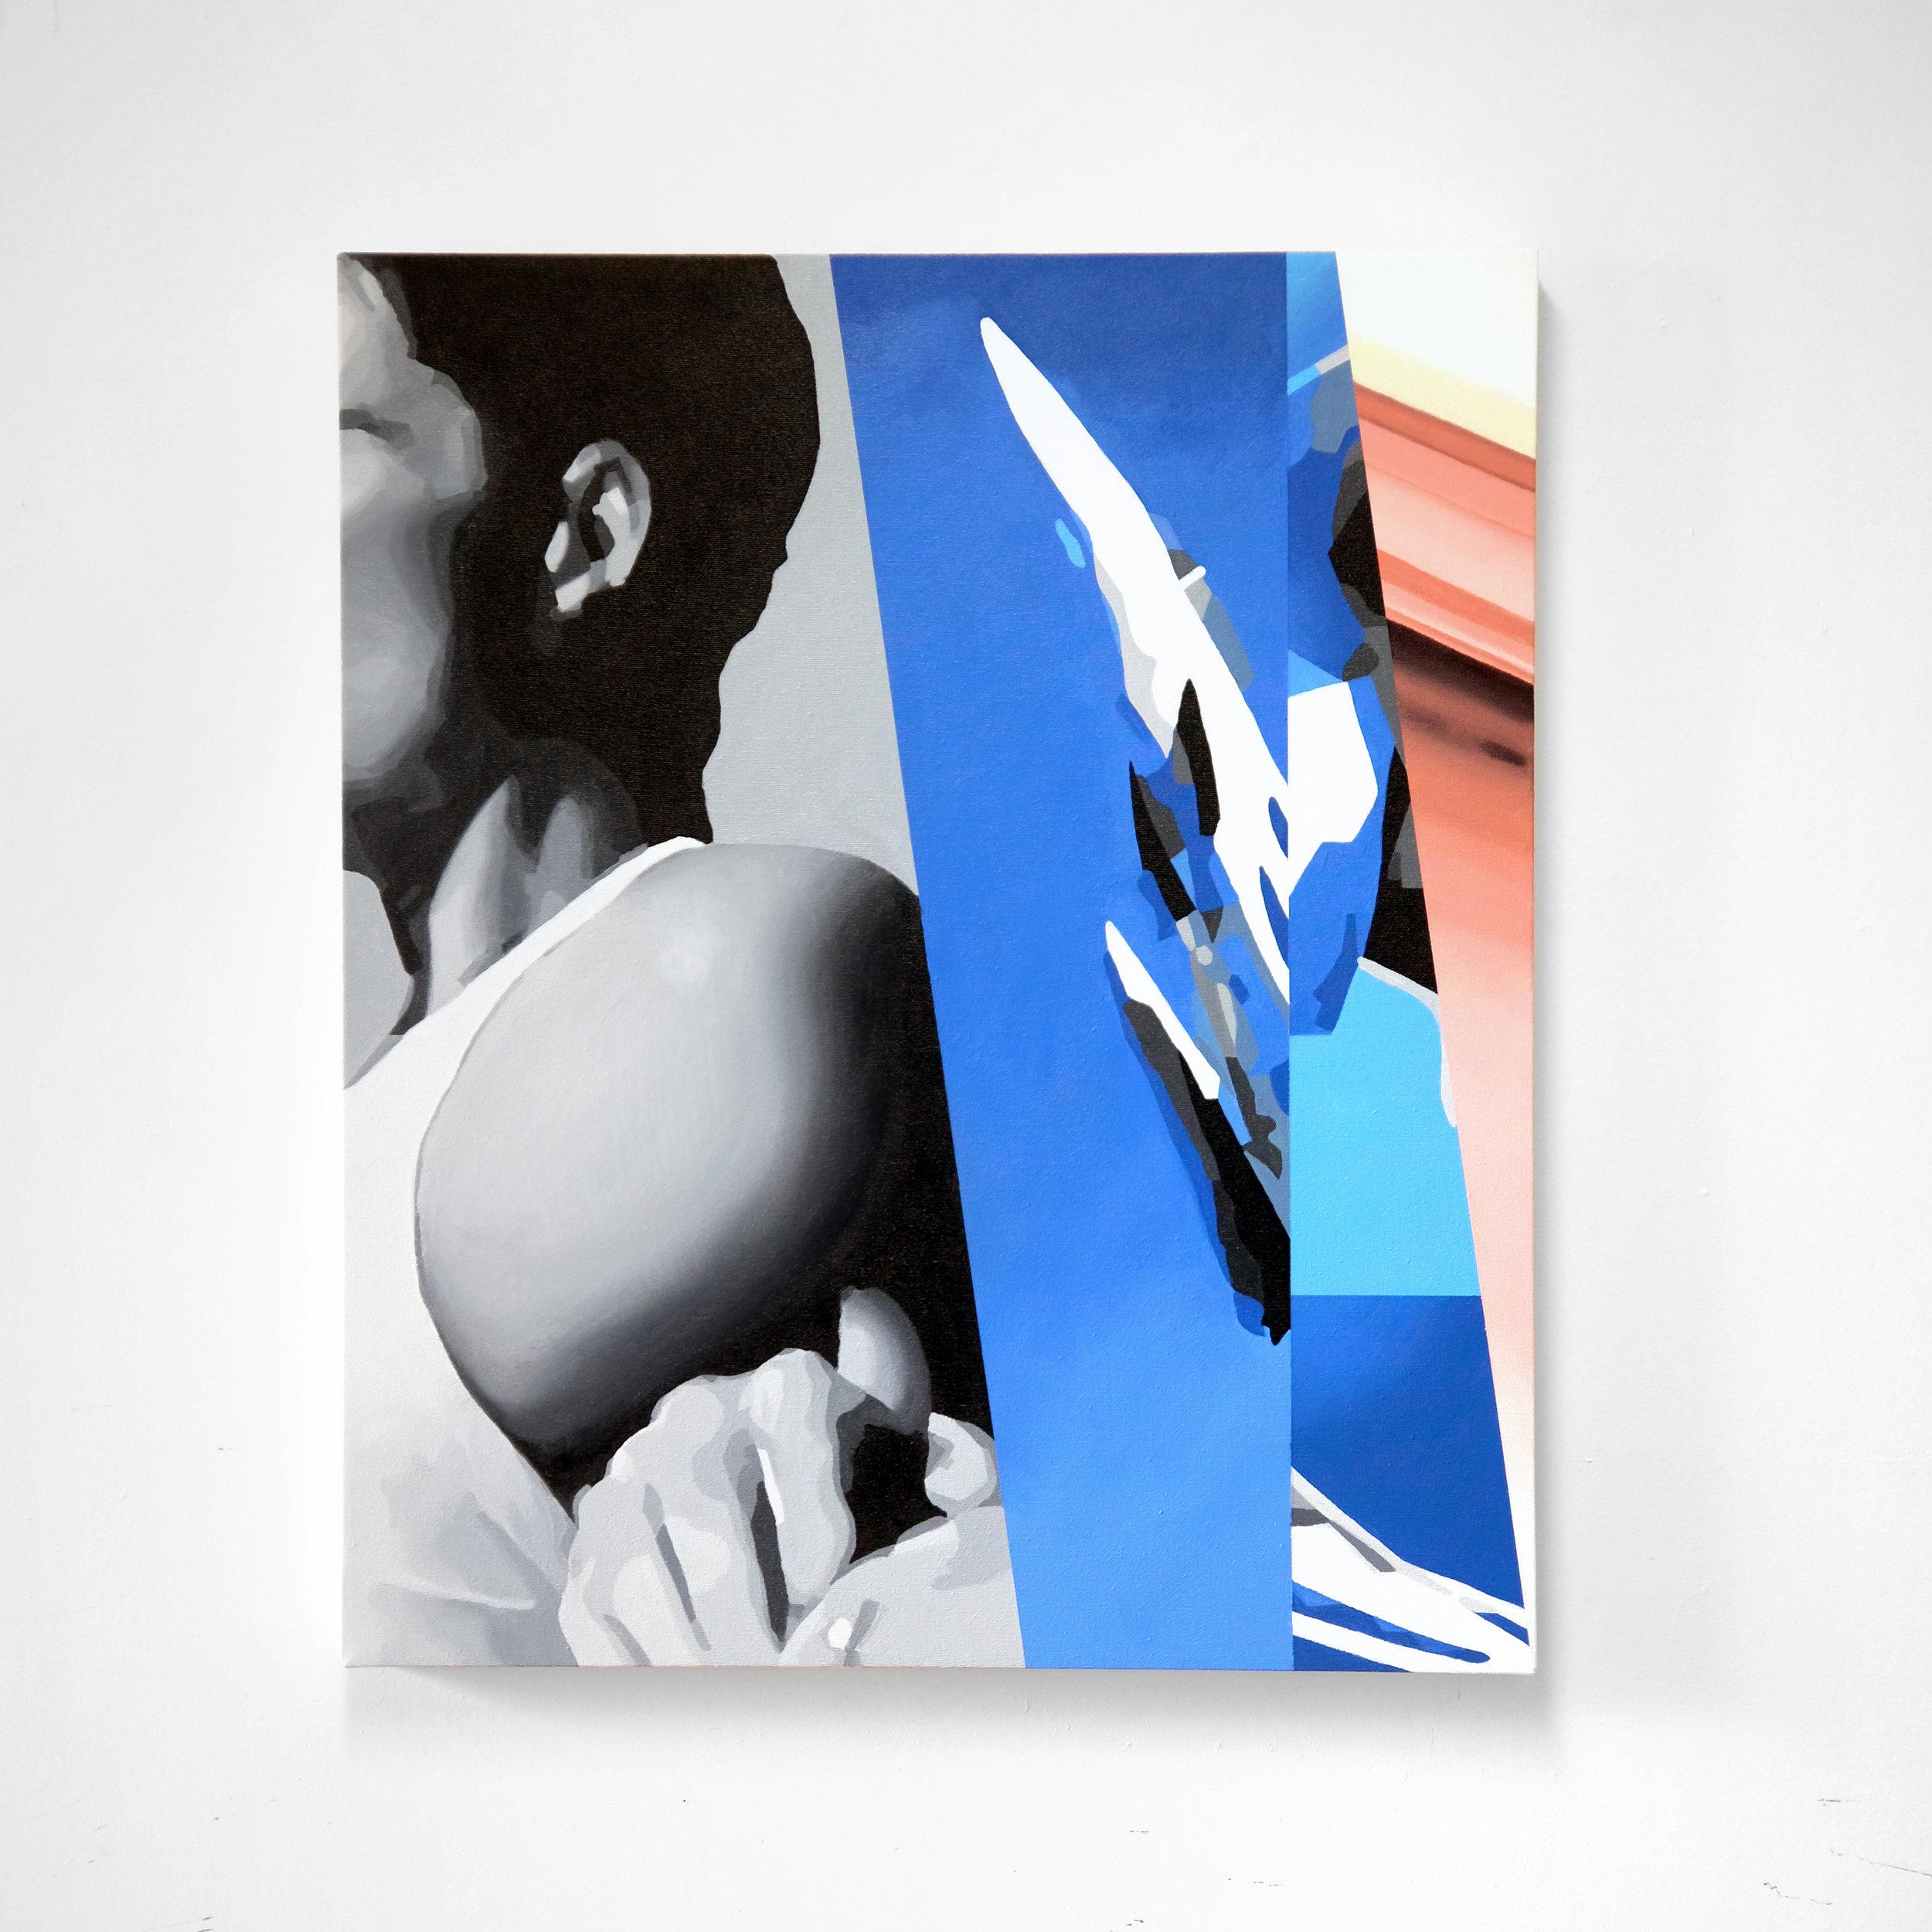 Escape, acrylic on canvas, 26x22in [66x56cm]